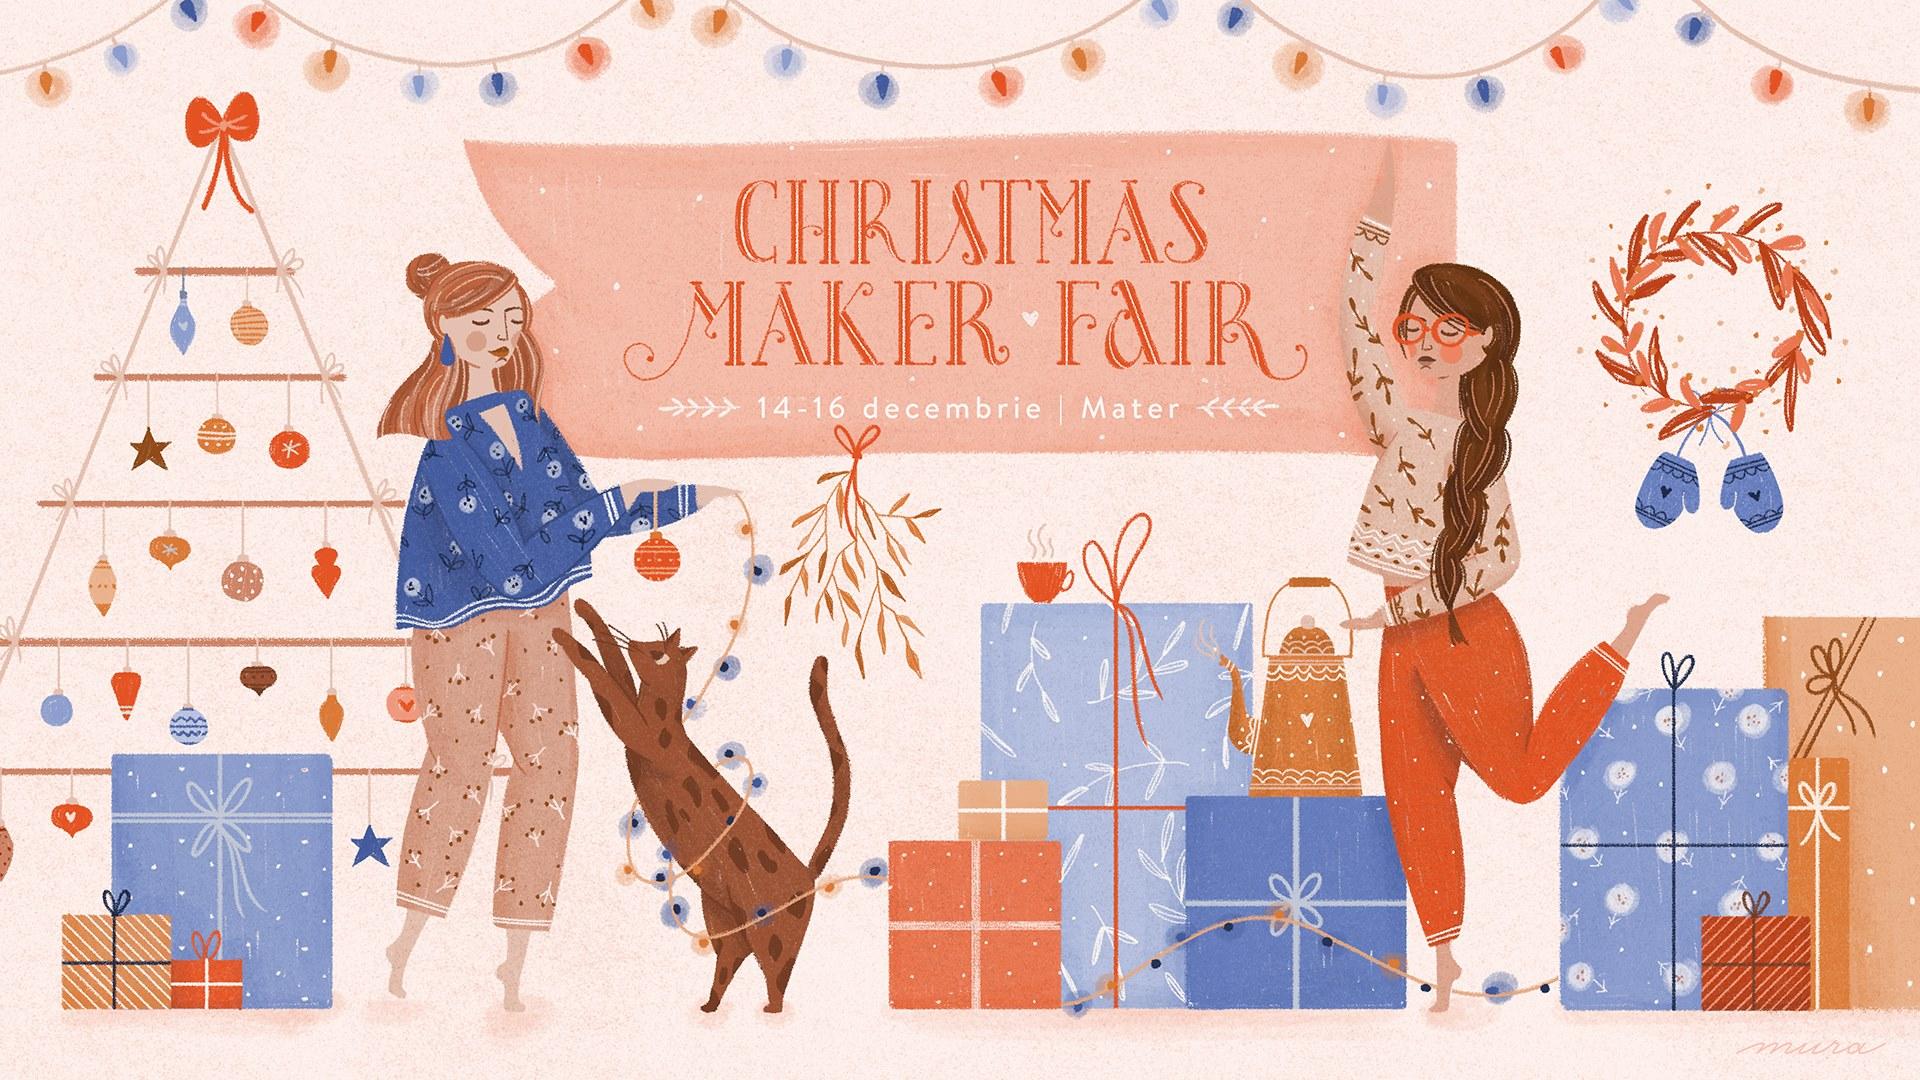 Christmas Maker Fair 2018